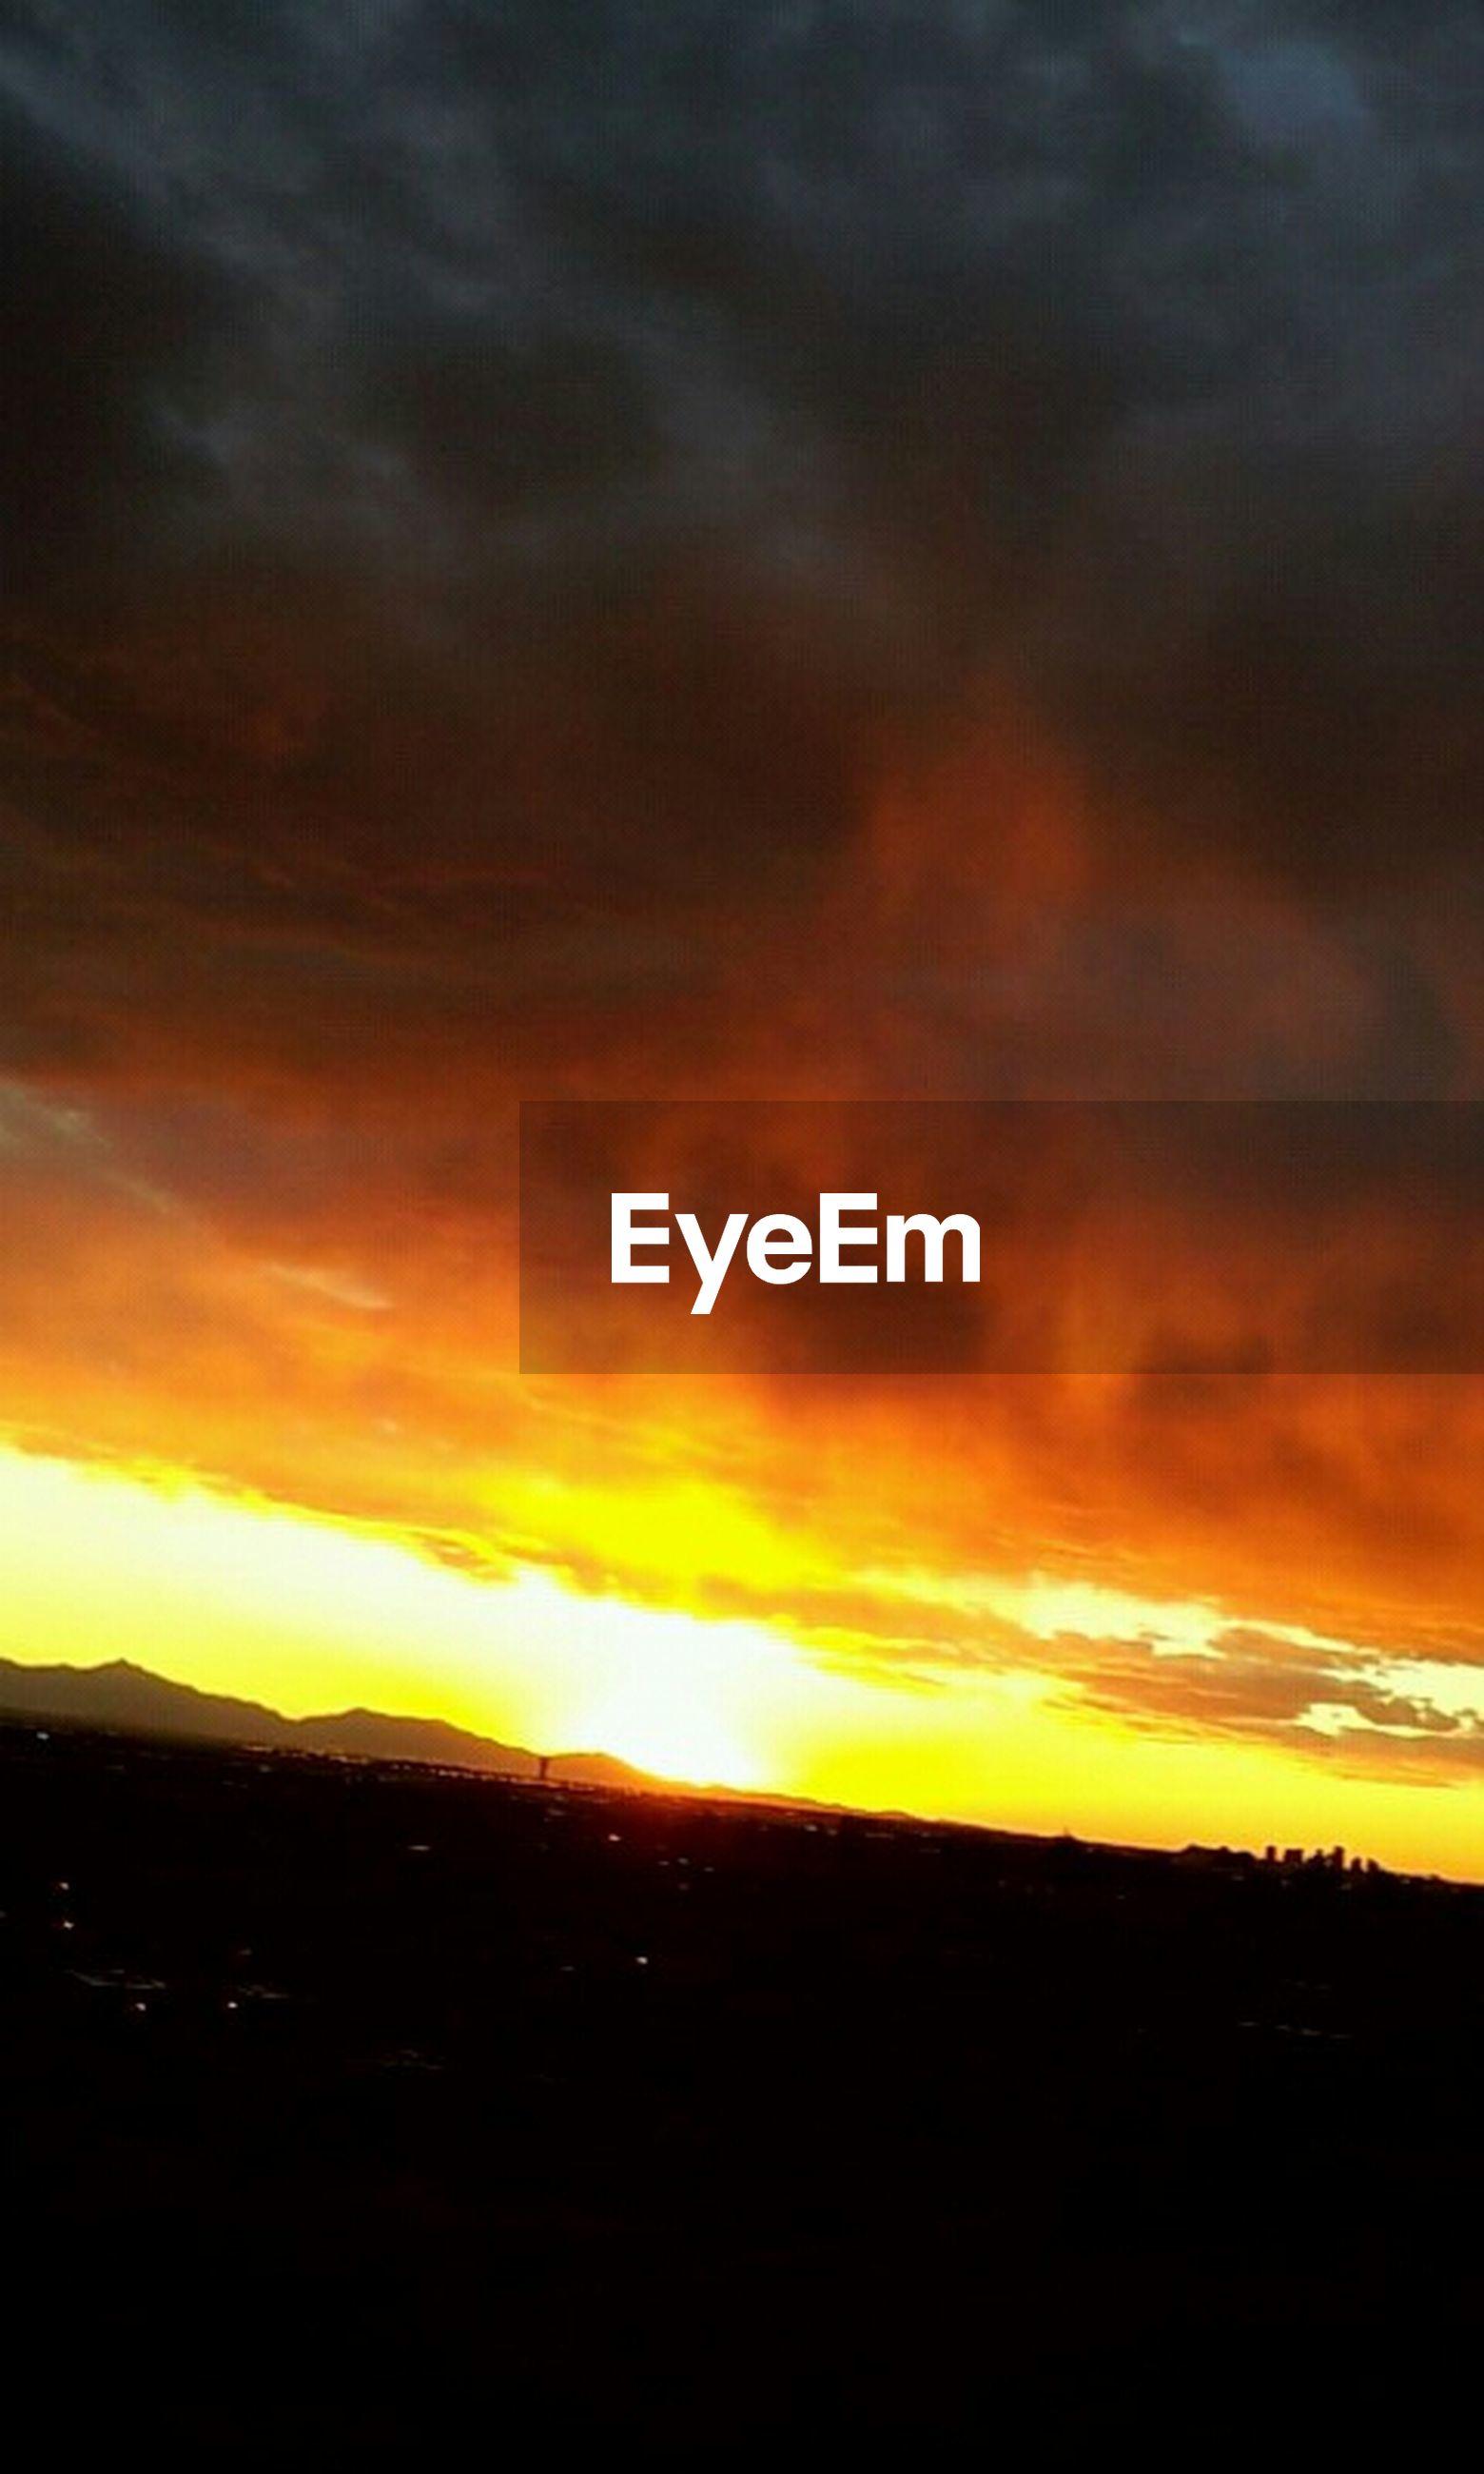 sunset, sky, scenics, orange color, beauty in nature, silhouette, tranquil scene, cloud - sky, tranquility, sun, dramatic sky, landscape, idyllic, nature, cloud, cloudy, moody sky, sunlight, atmospheric mood, outdoors